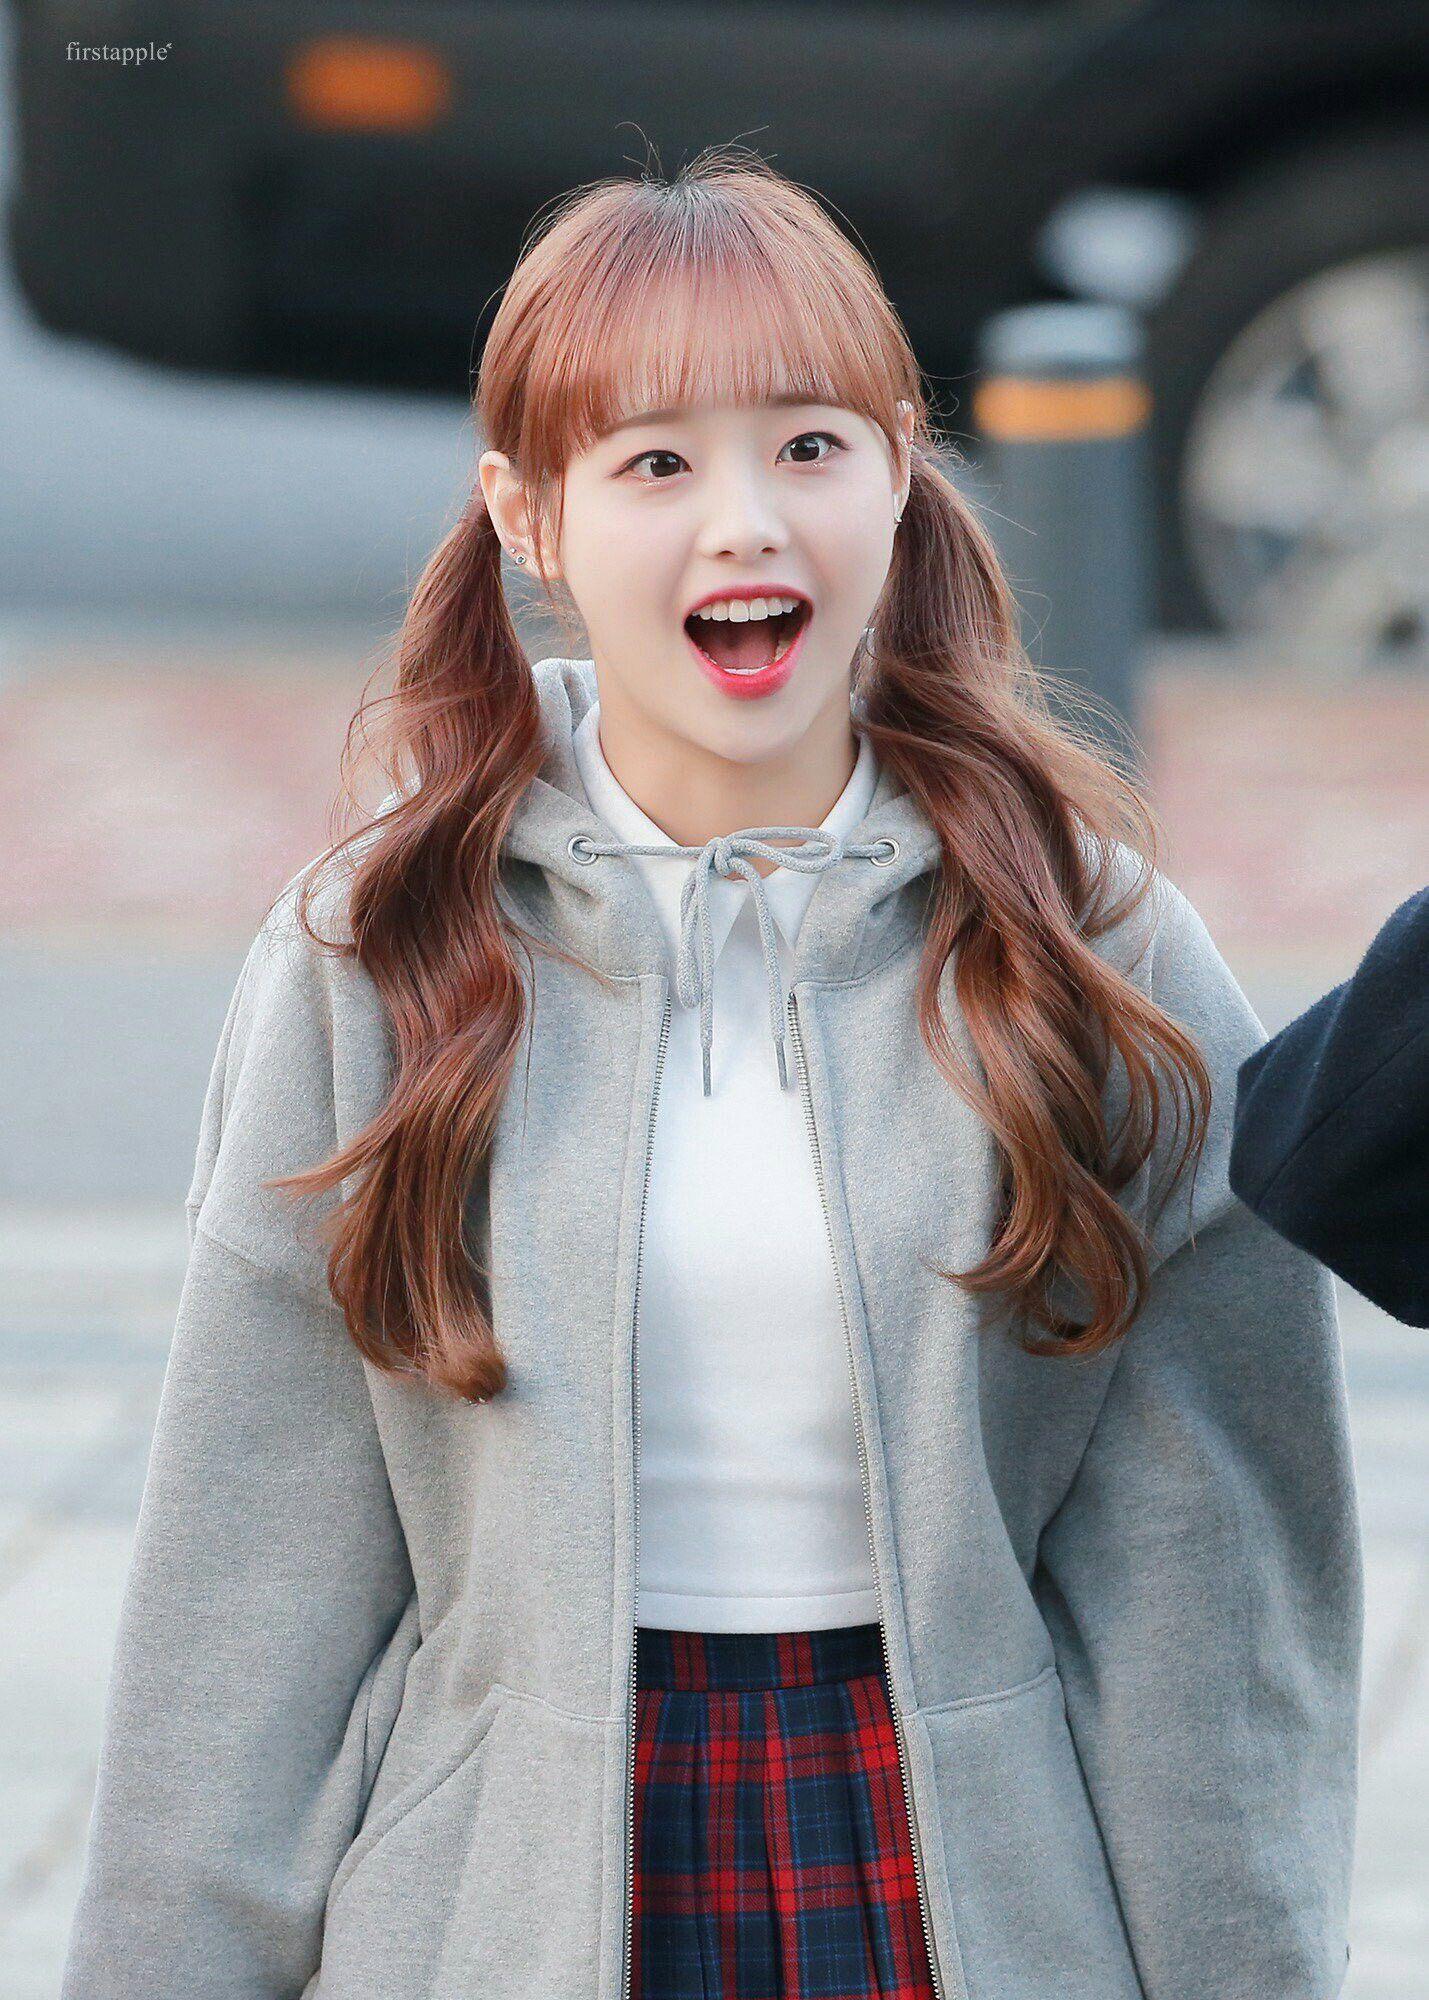 Chuu Loona Kpop Chuu Loona Kpop Girls Kpop Girl Groups